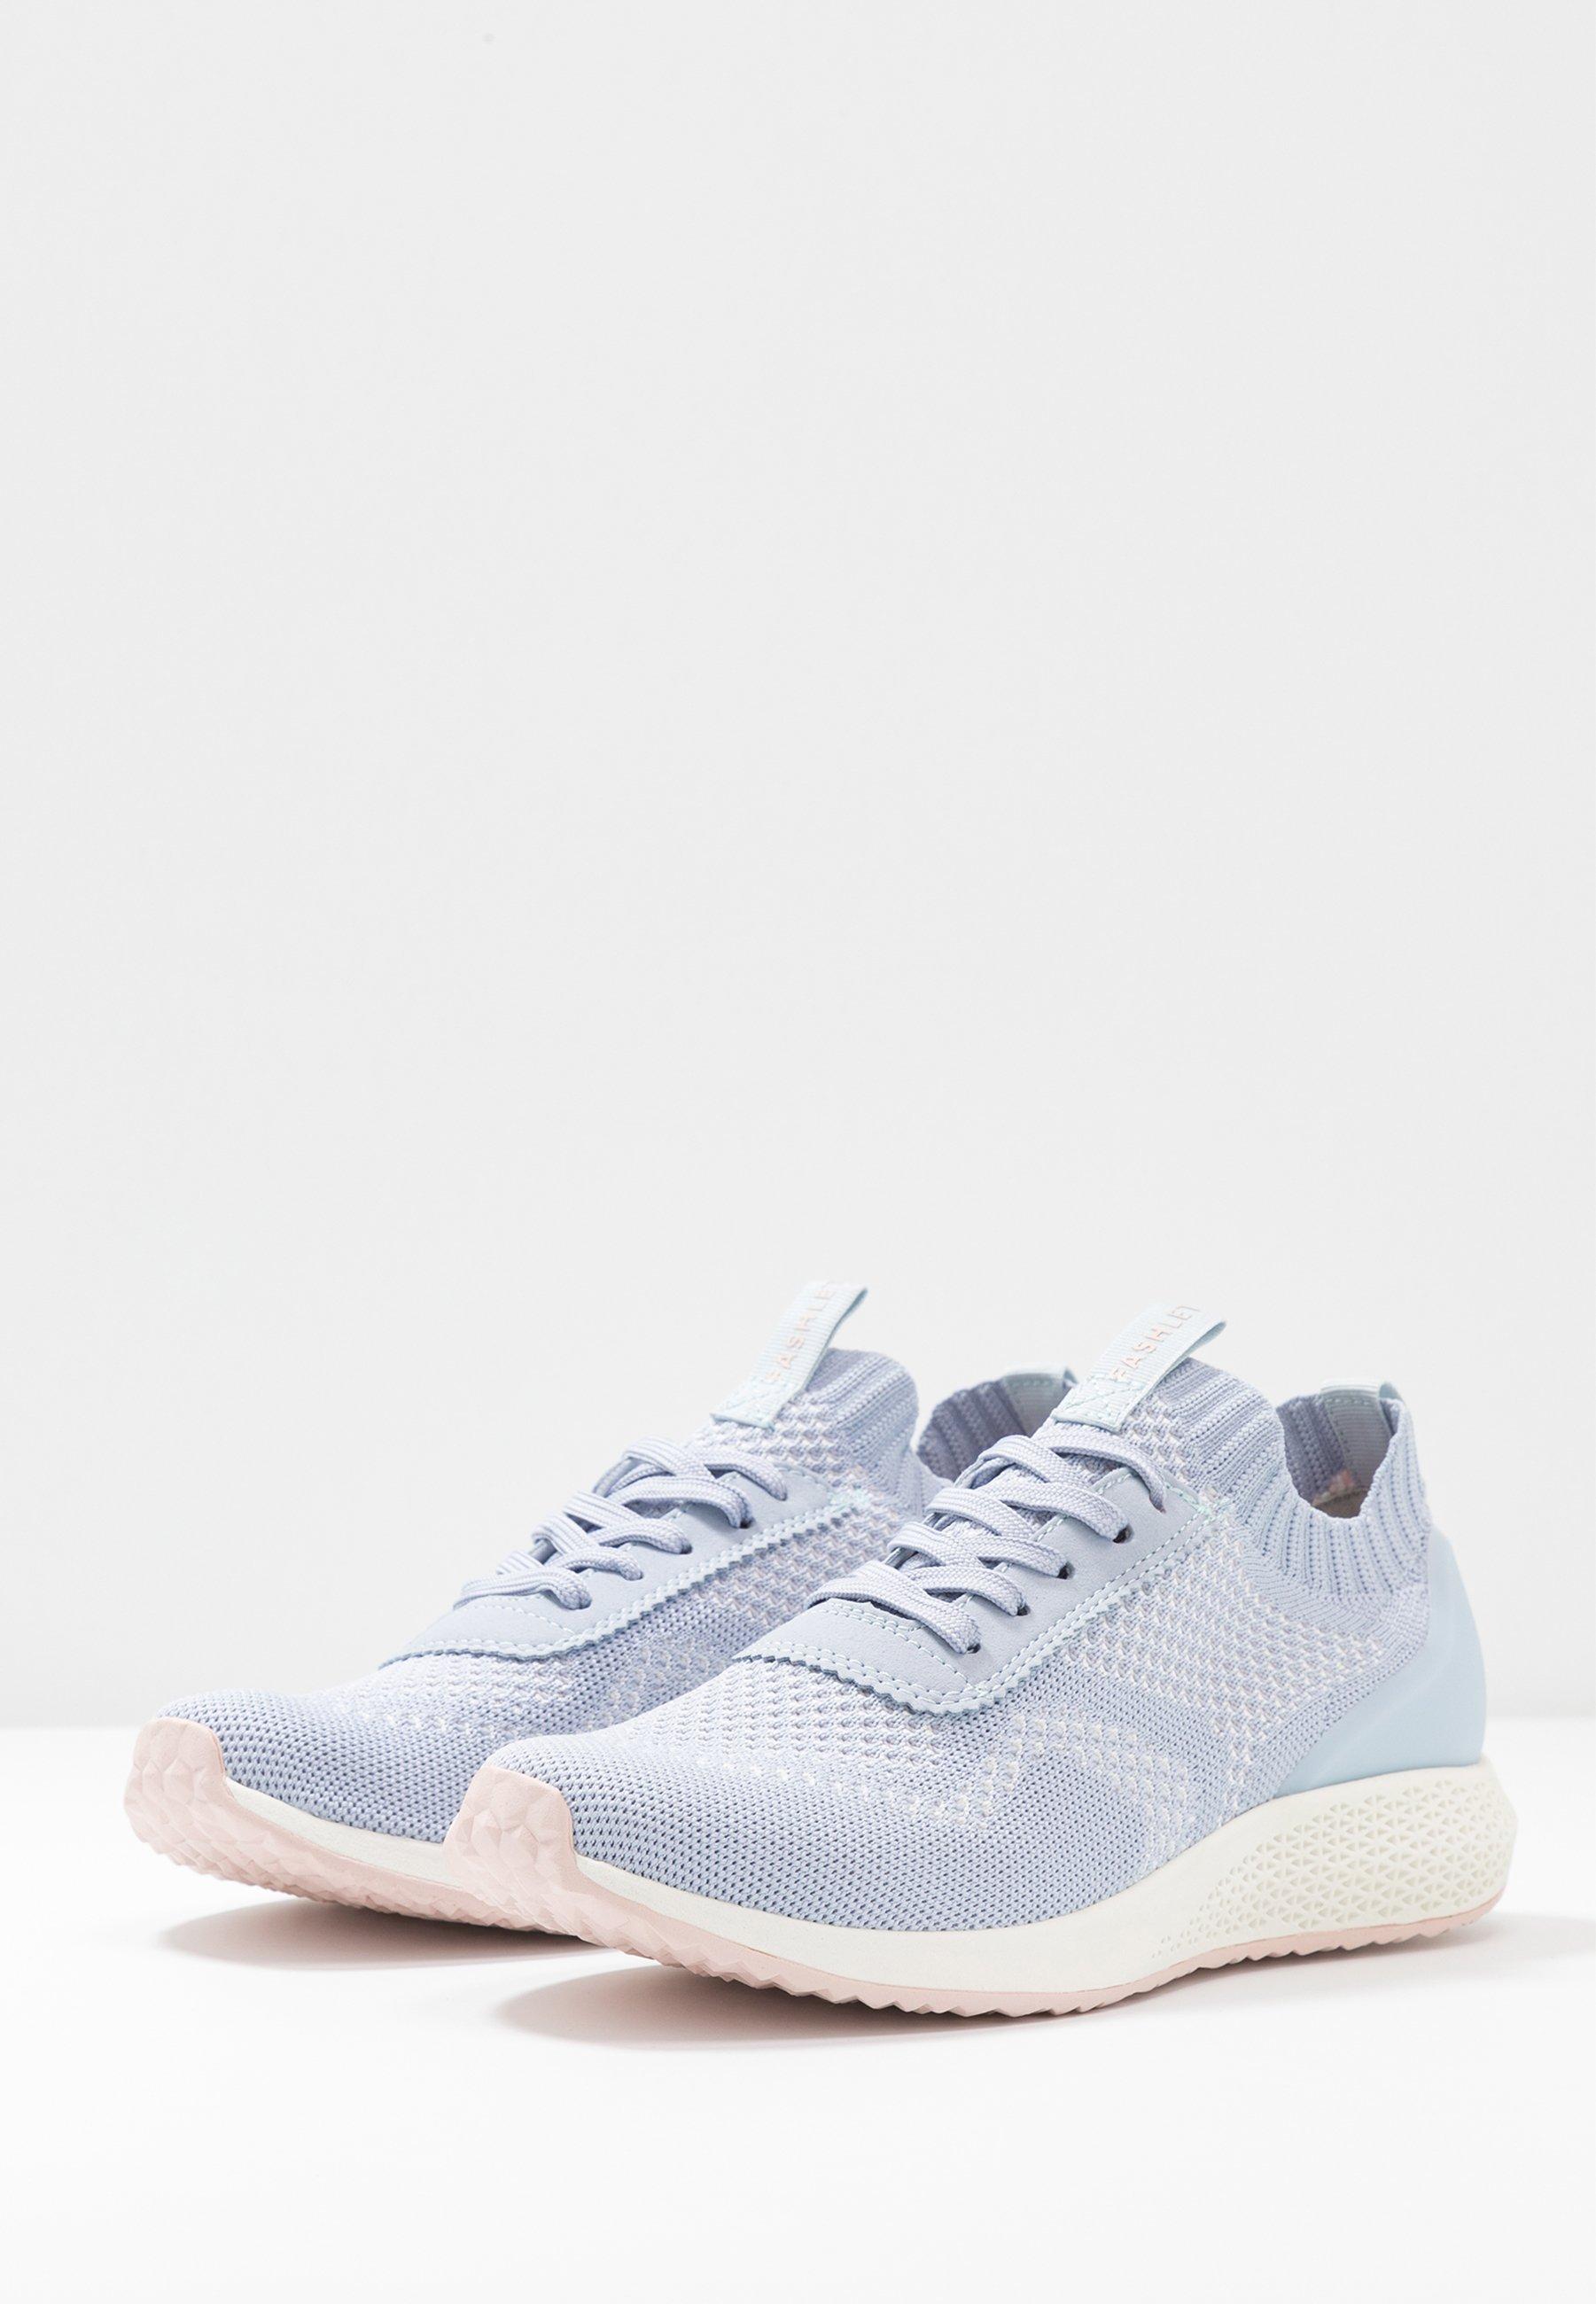 Tamaris Fashletics Baskets basses - powder blue - Sneakers femme De gros